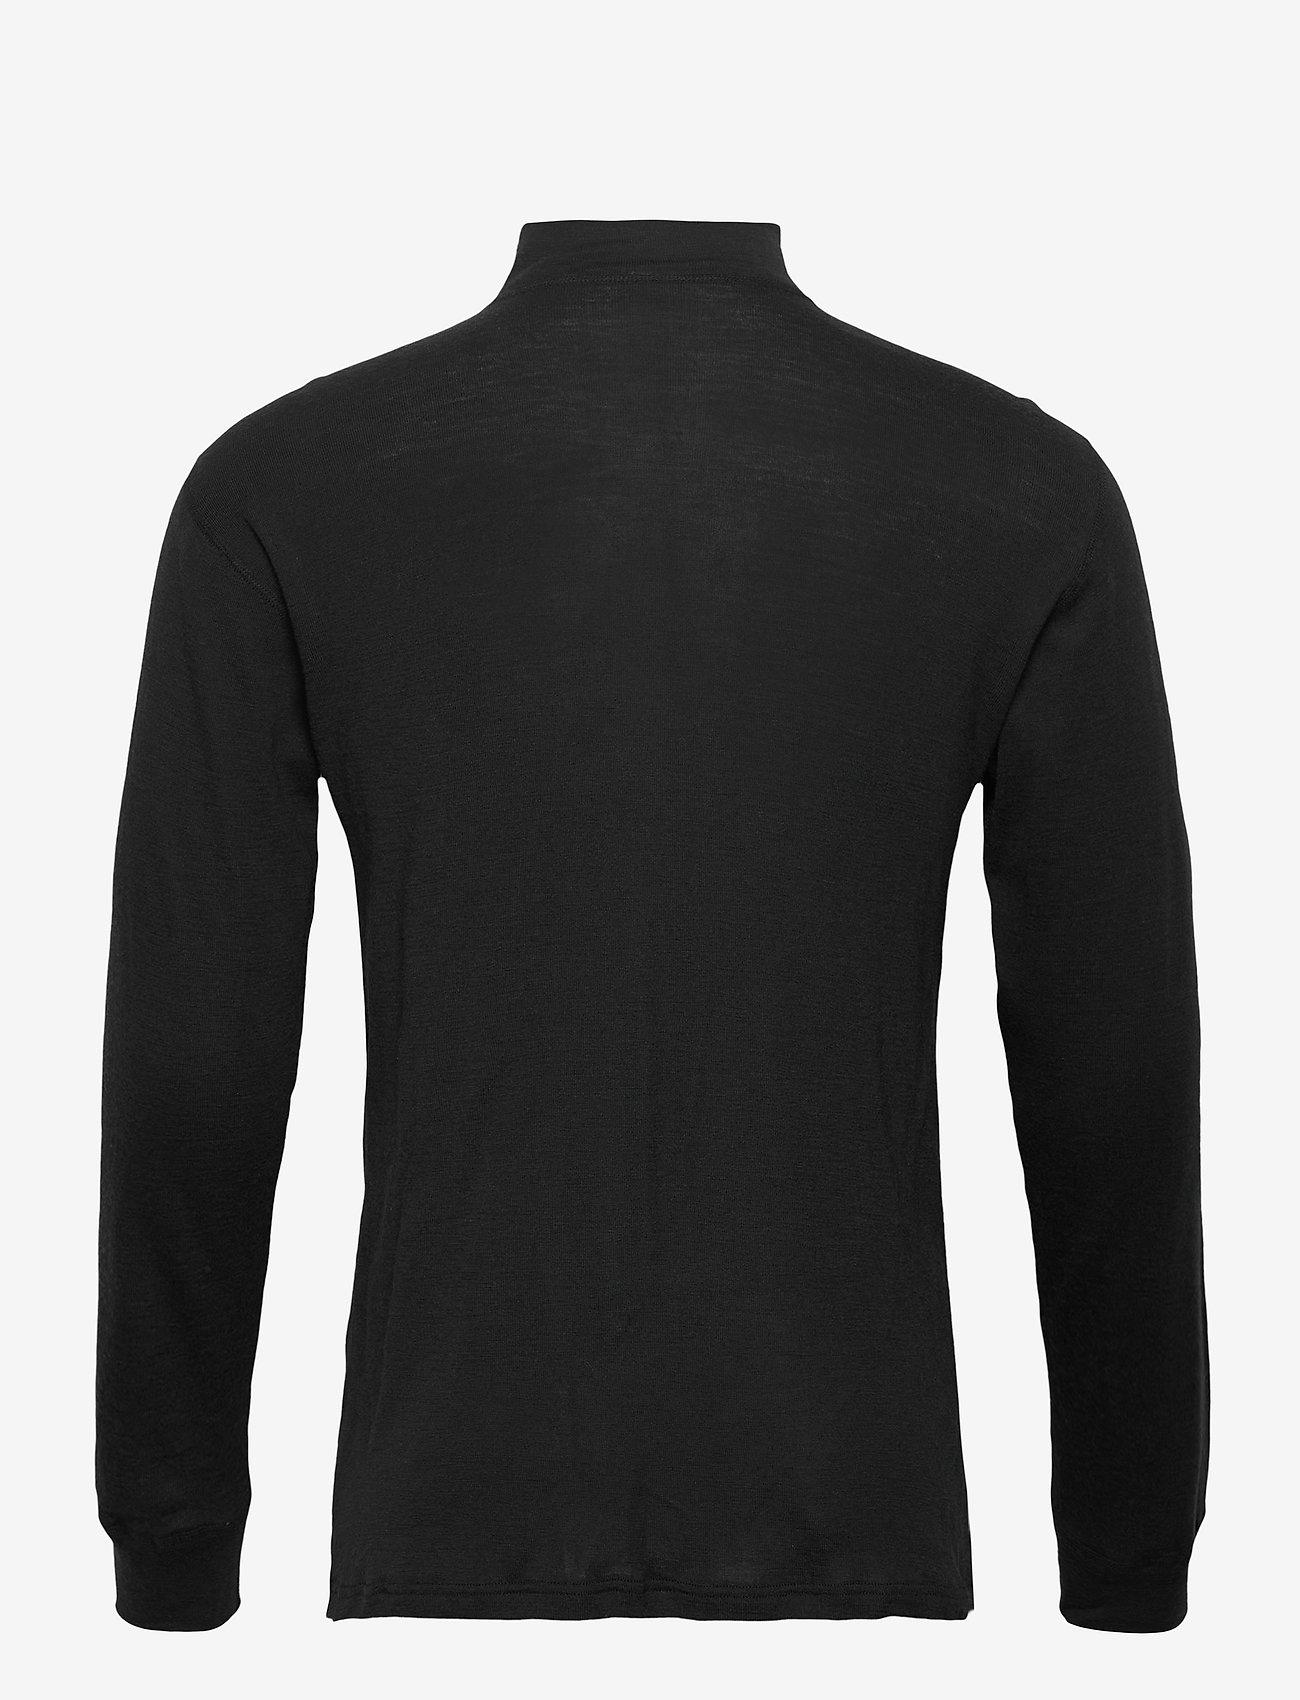 Dovre - Dovre Wool 1/1 ærme & Zipper - half zip - black - 1